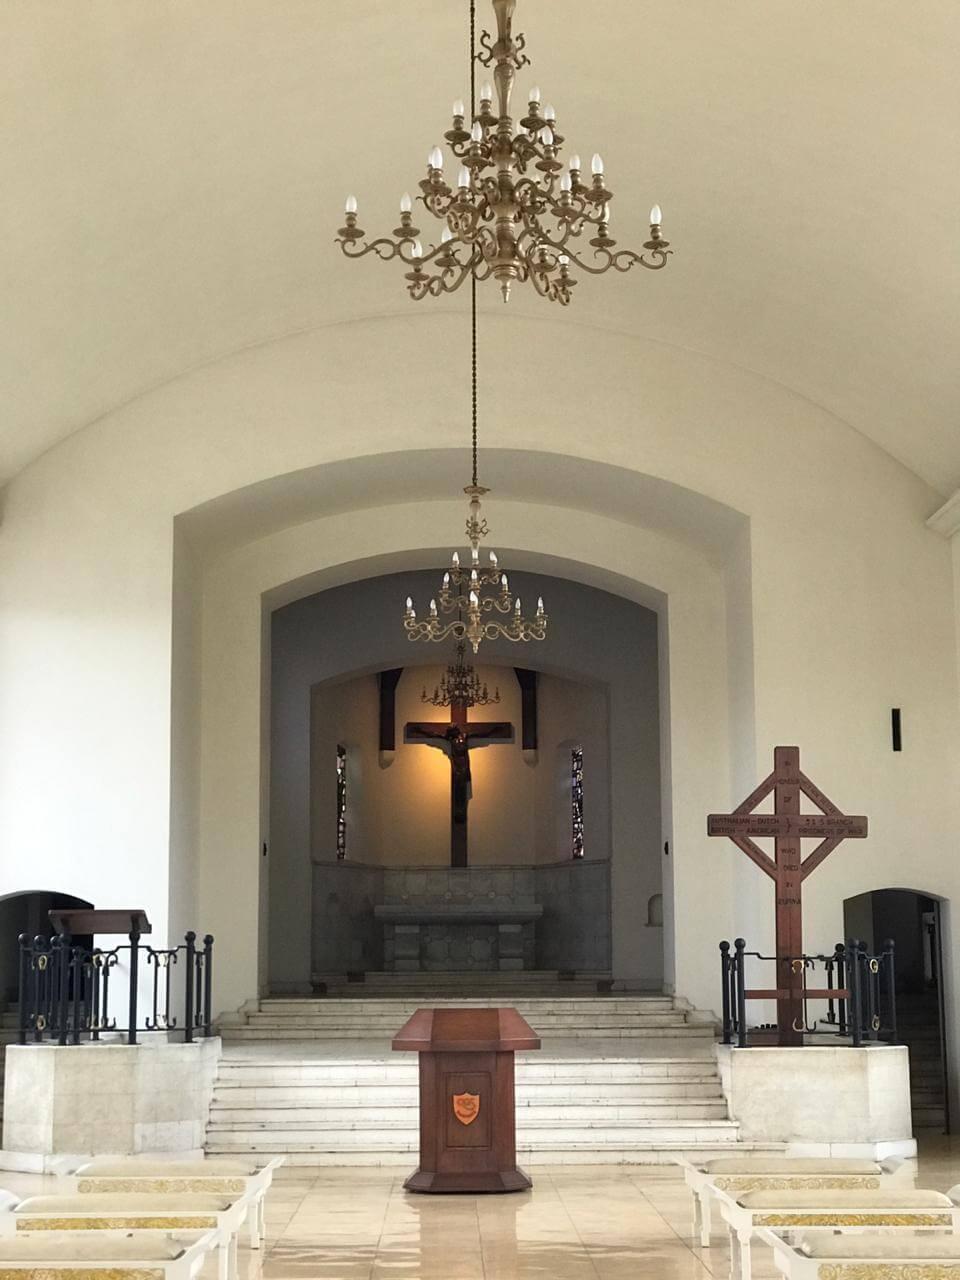 Melawat ke Makam Kehormatan Belanda